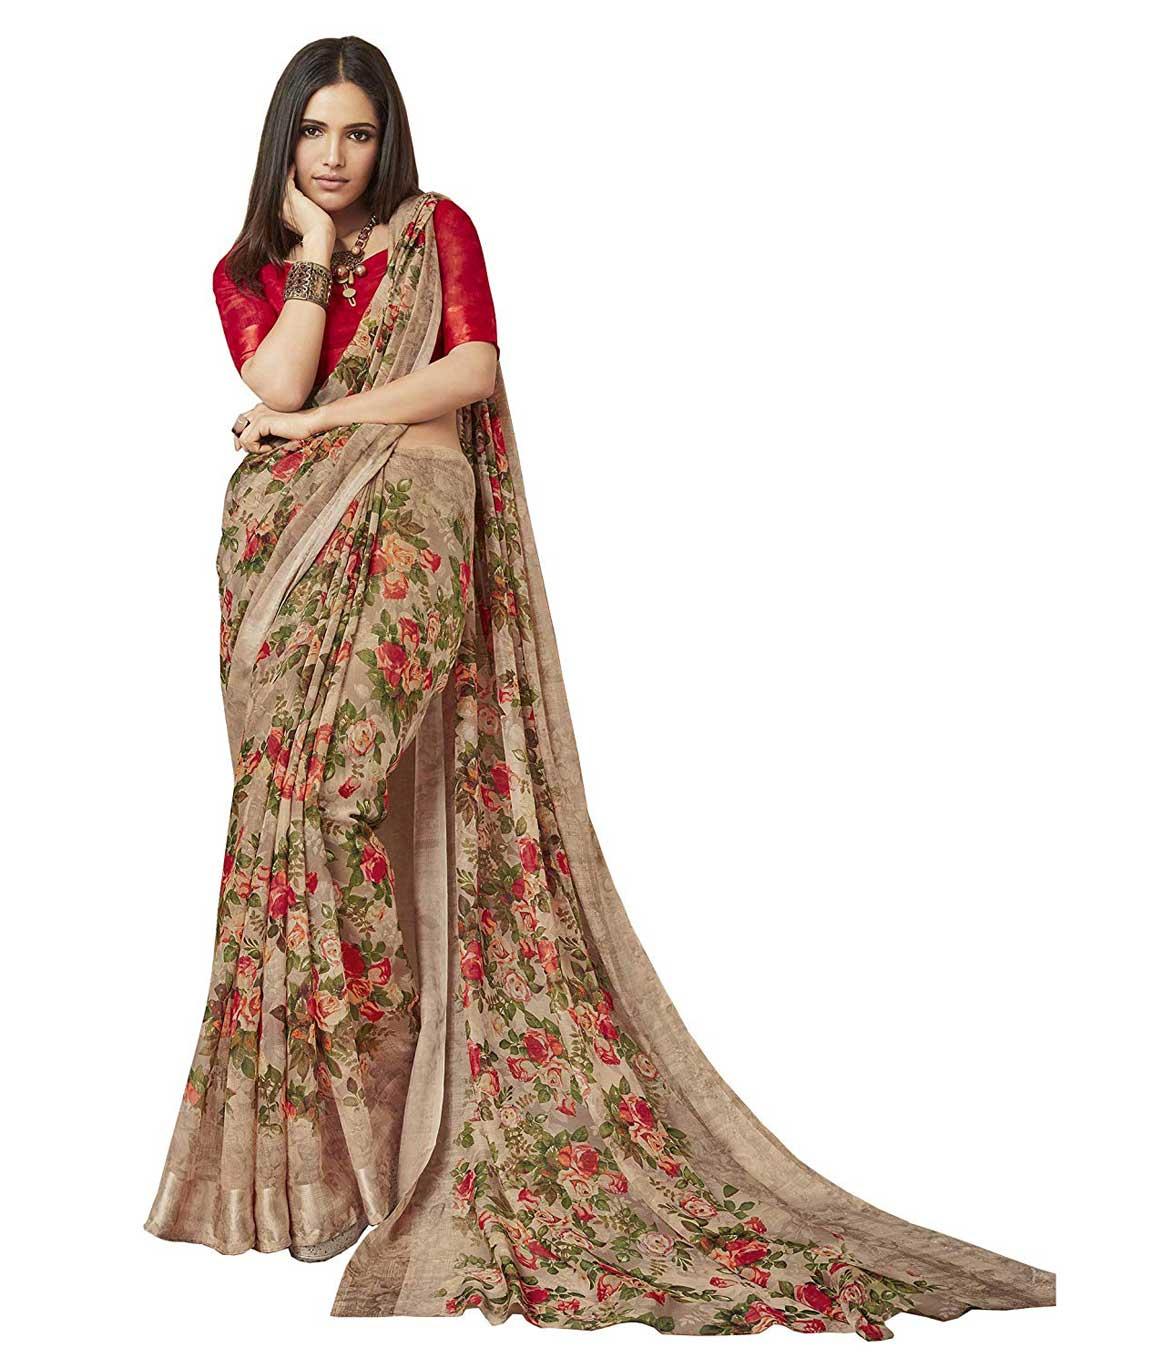 Shangrila Designer Women`s Digital Printed Linen Cotton Saree with Unstitched Blouse (Brown)